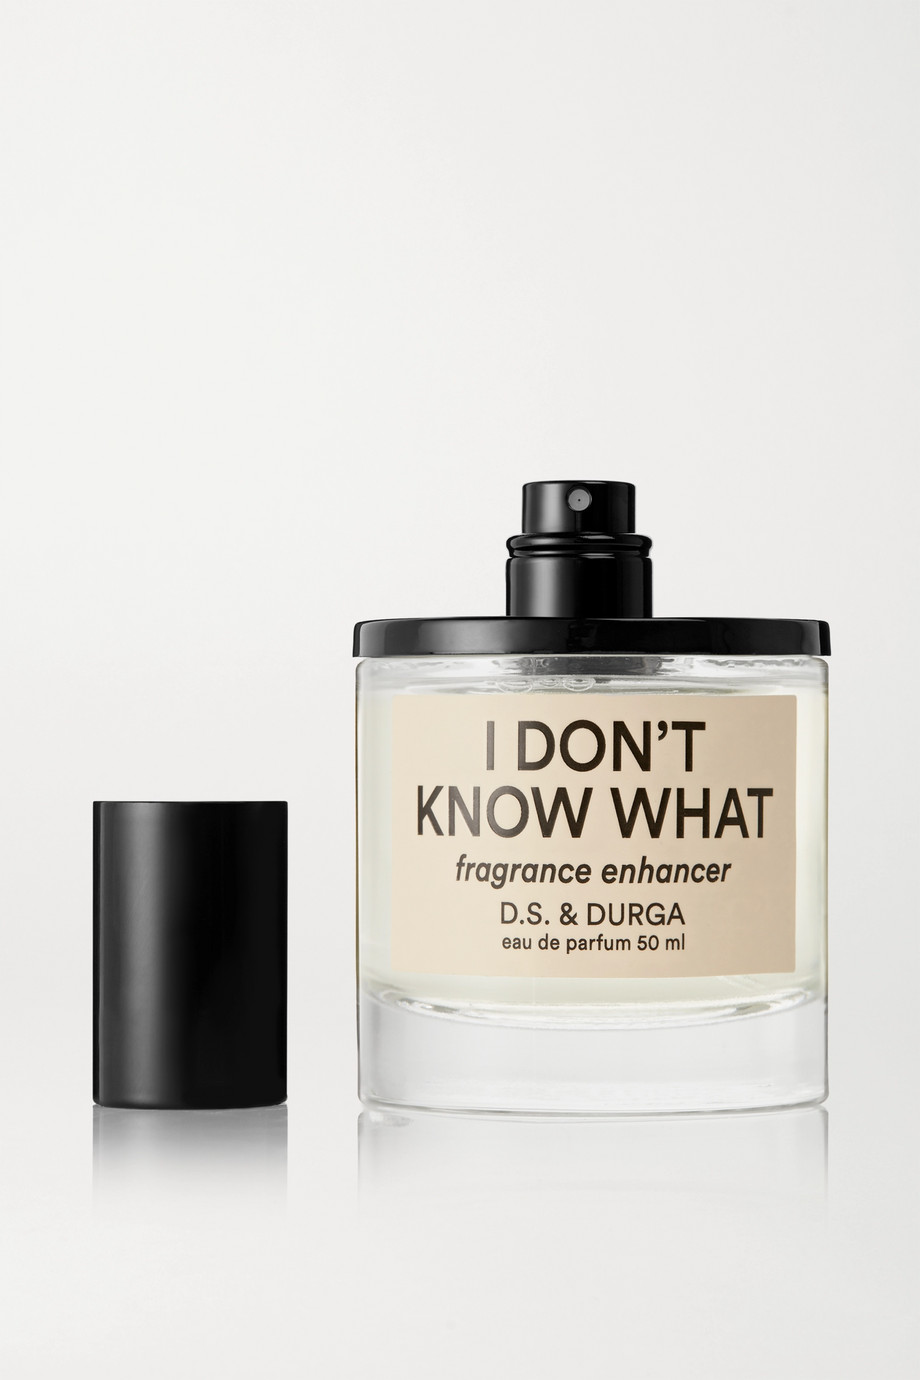 D.S. & Durga I Don't Know What Fragrance Enhancer, 50ml